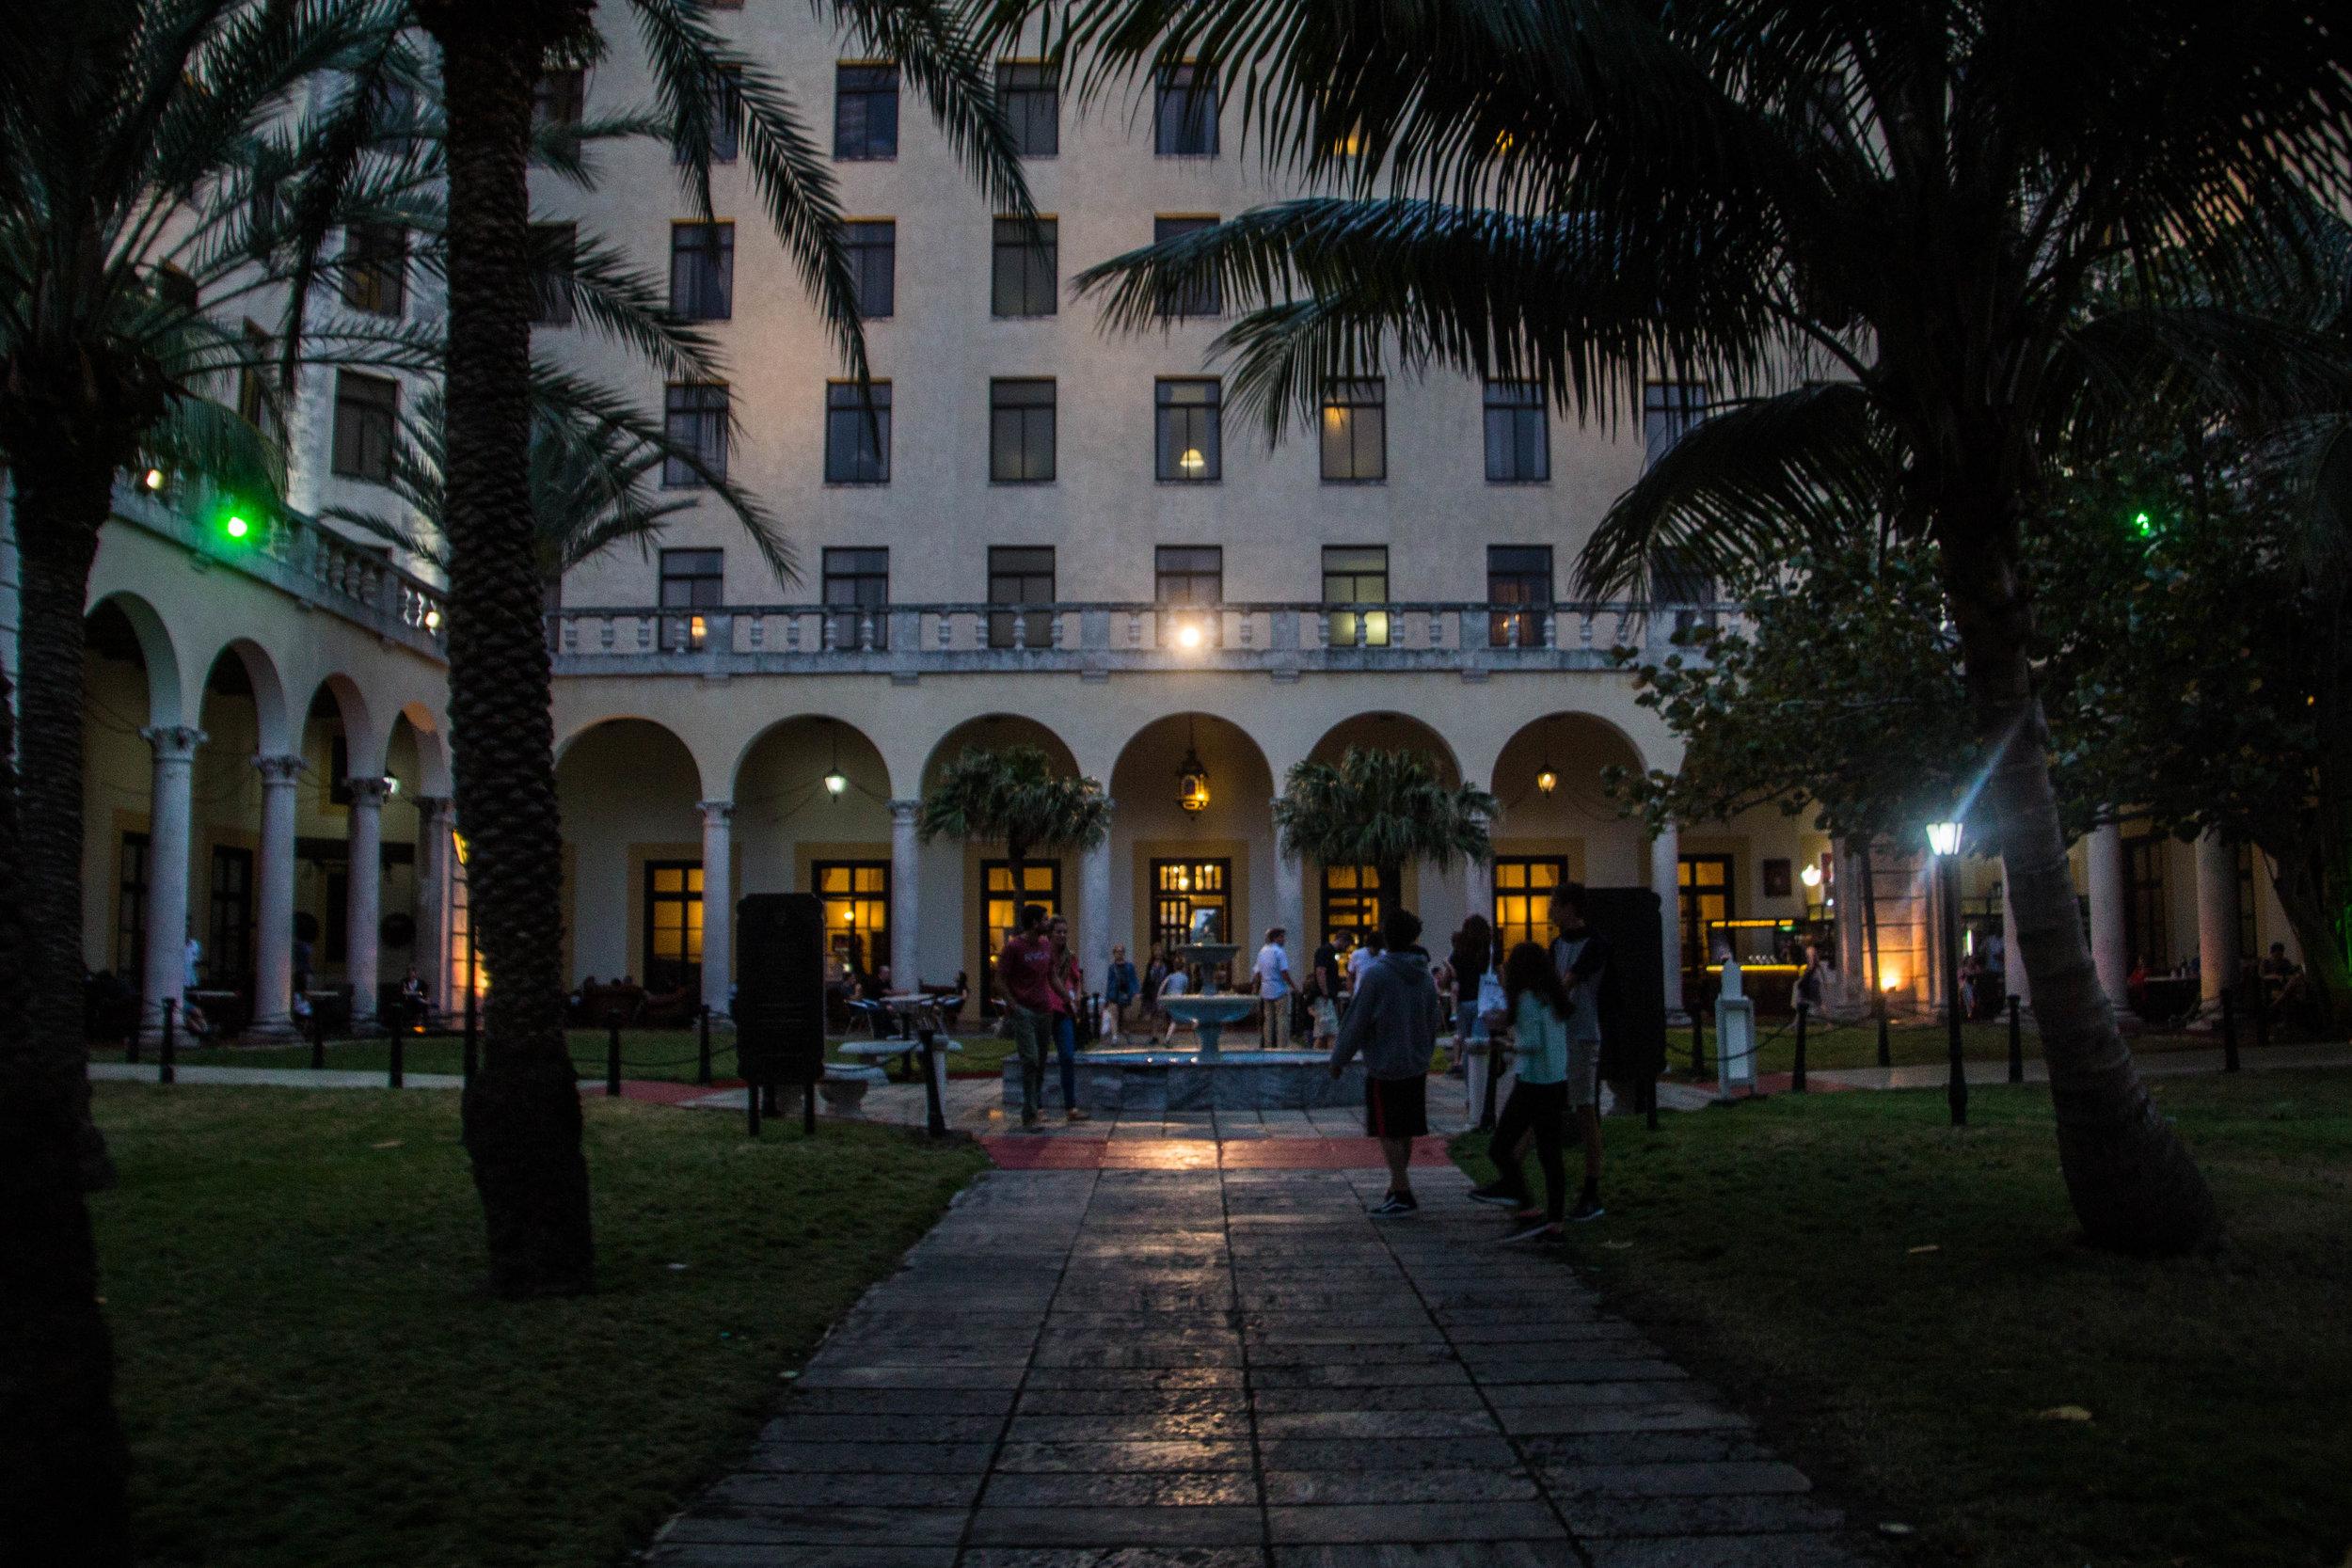 hotel nacional de cuba havana-1-3-2.jpg